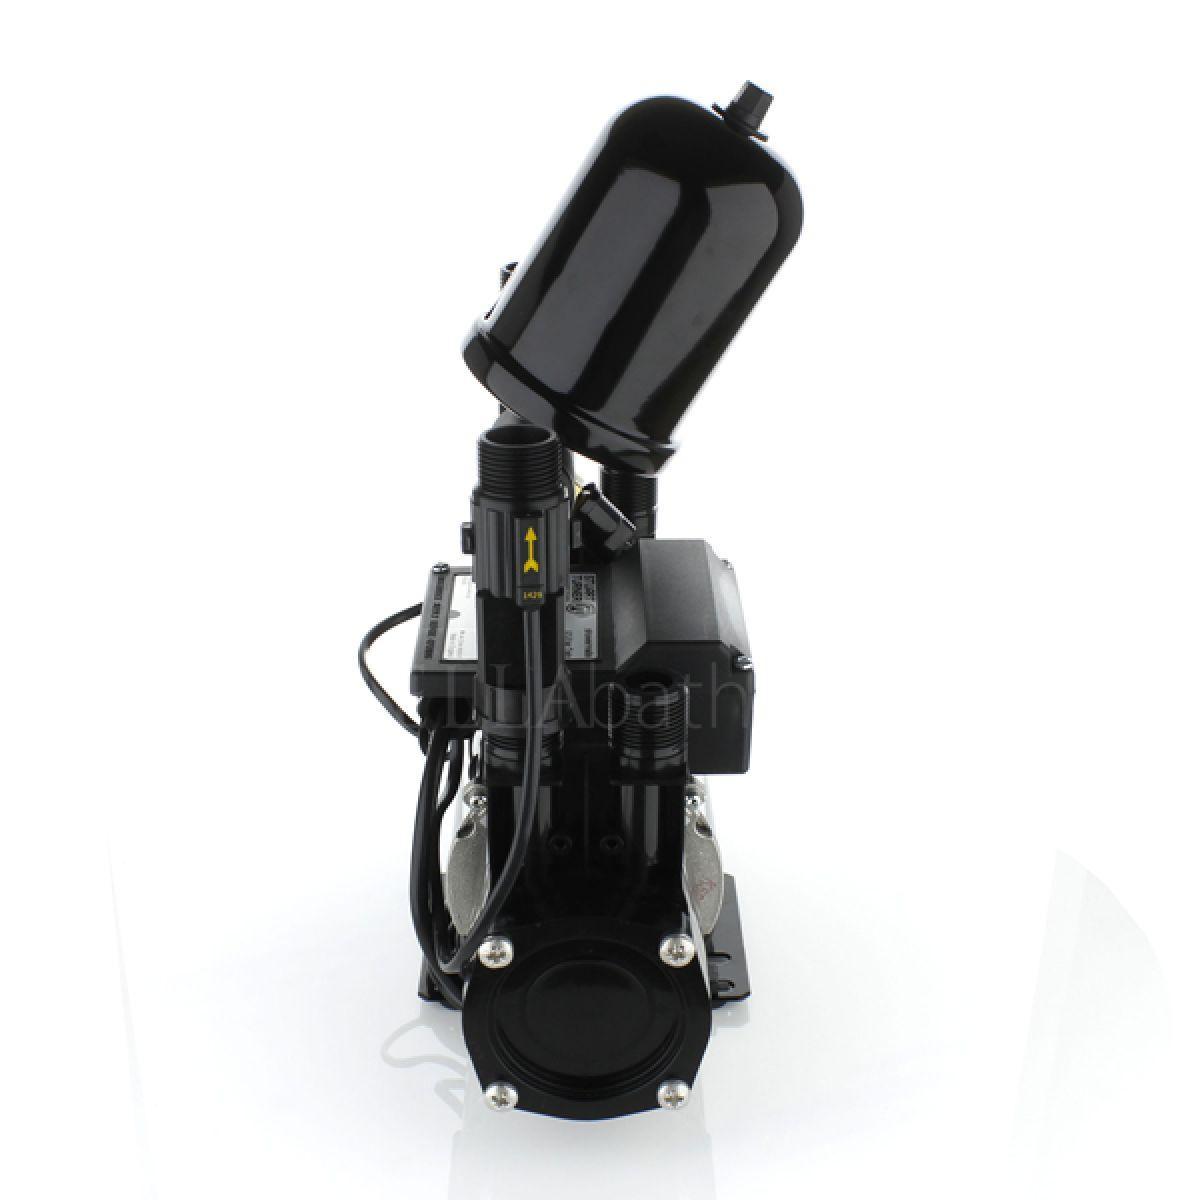 Stuart Turner 46532 Showermate Universal Twin 1.8 Bar Pump - Left